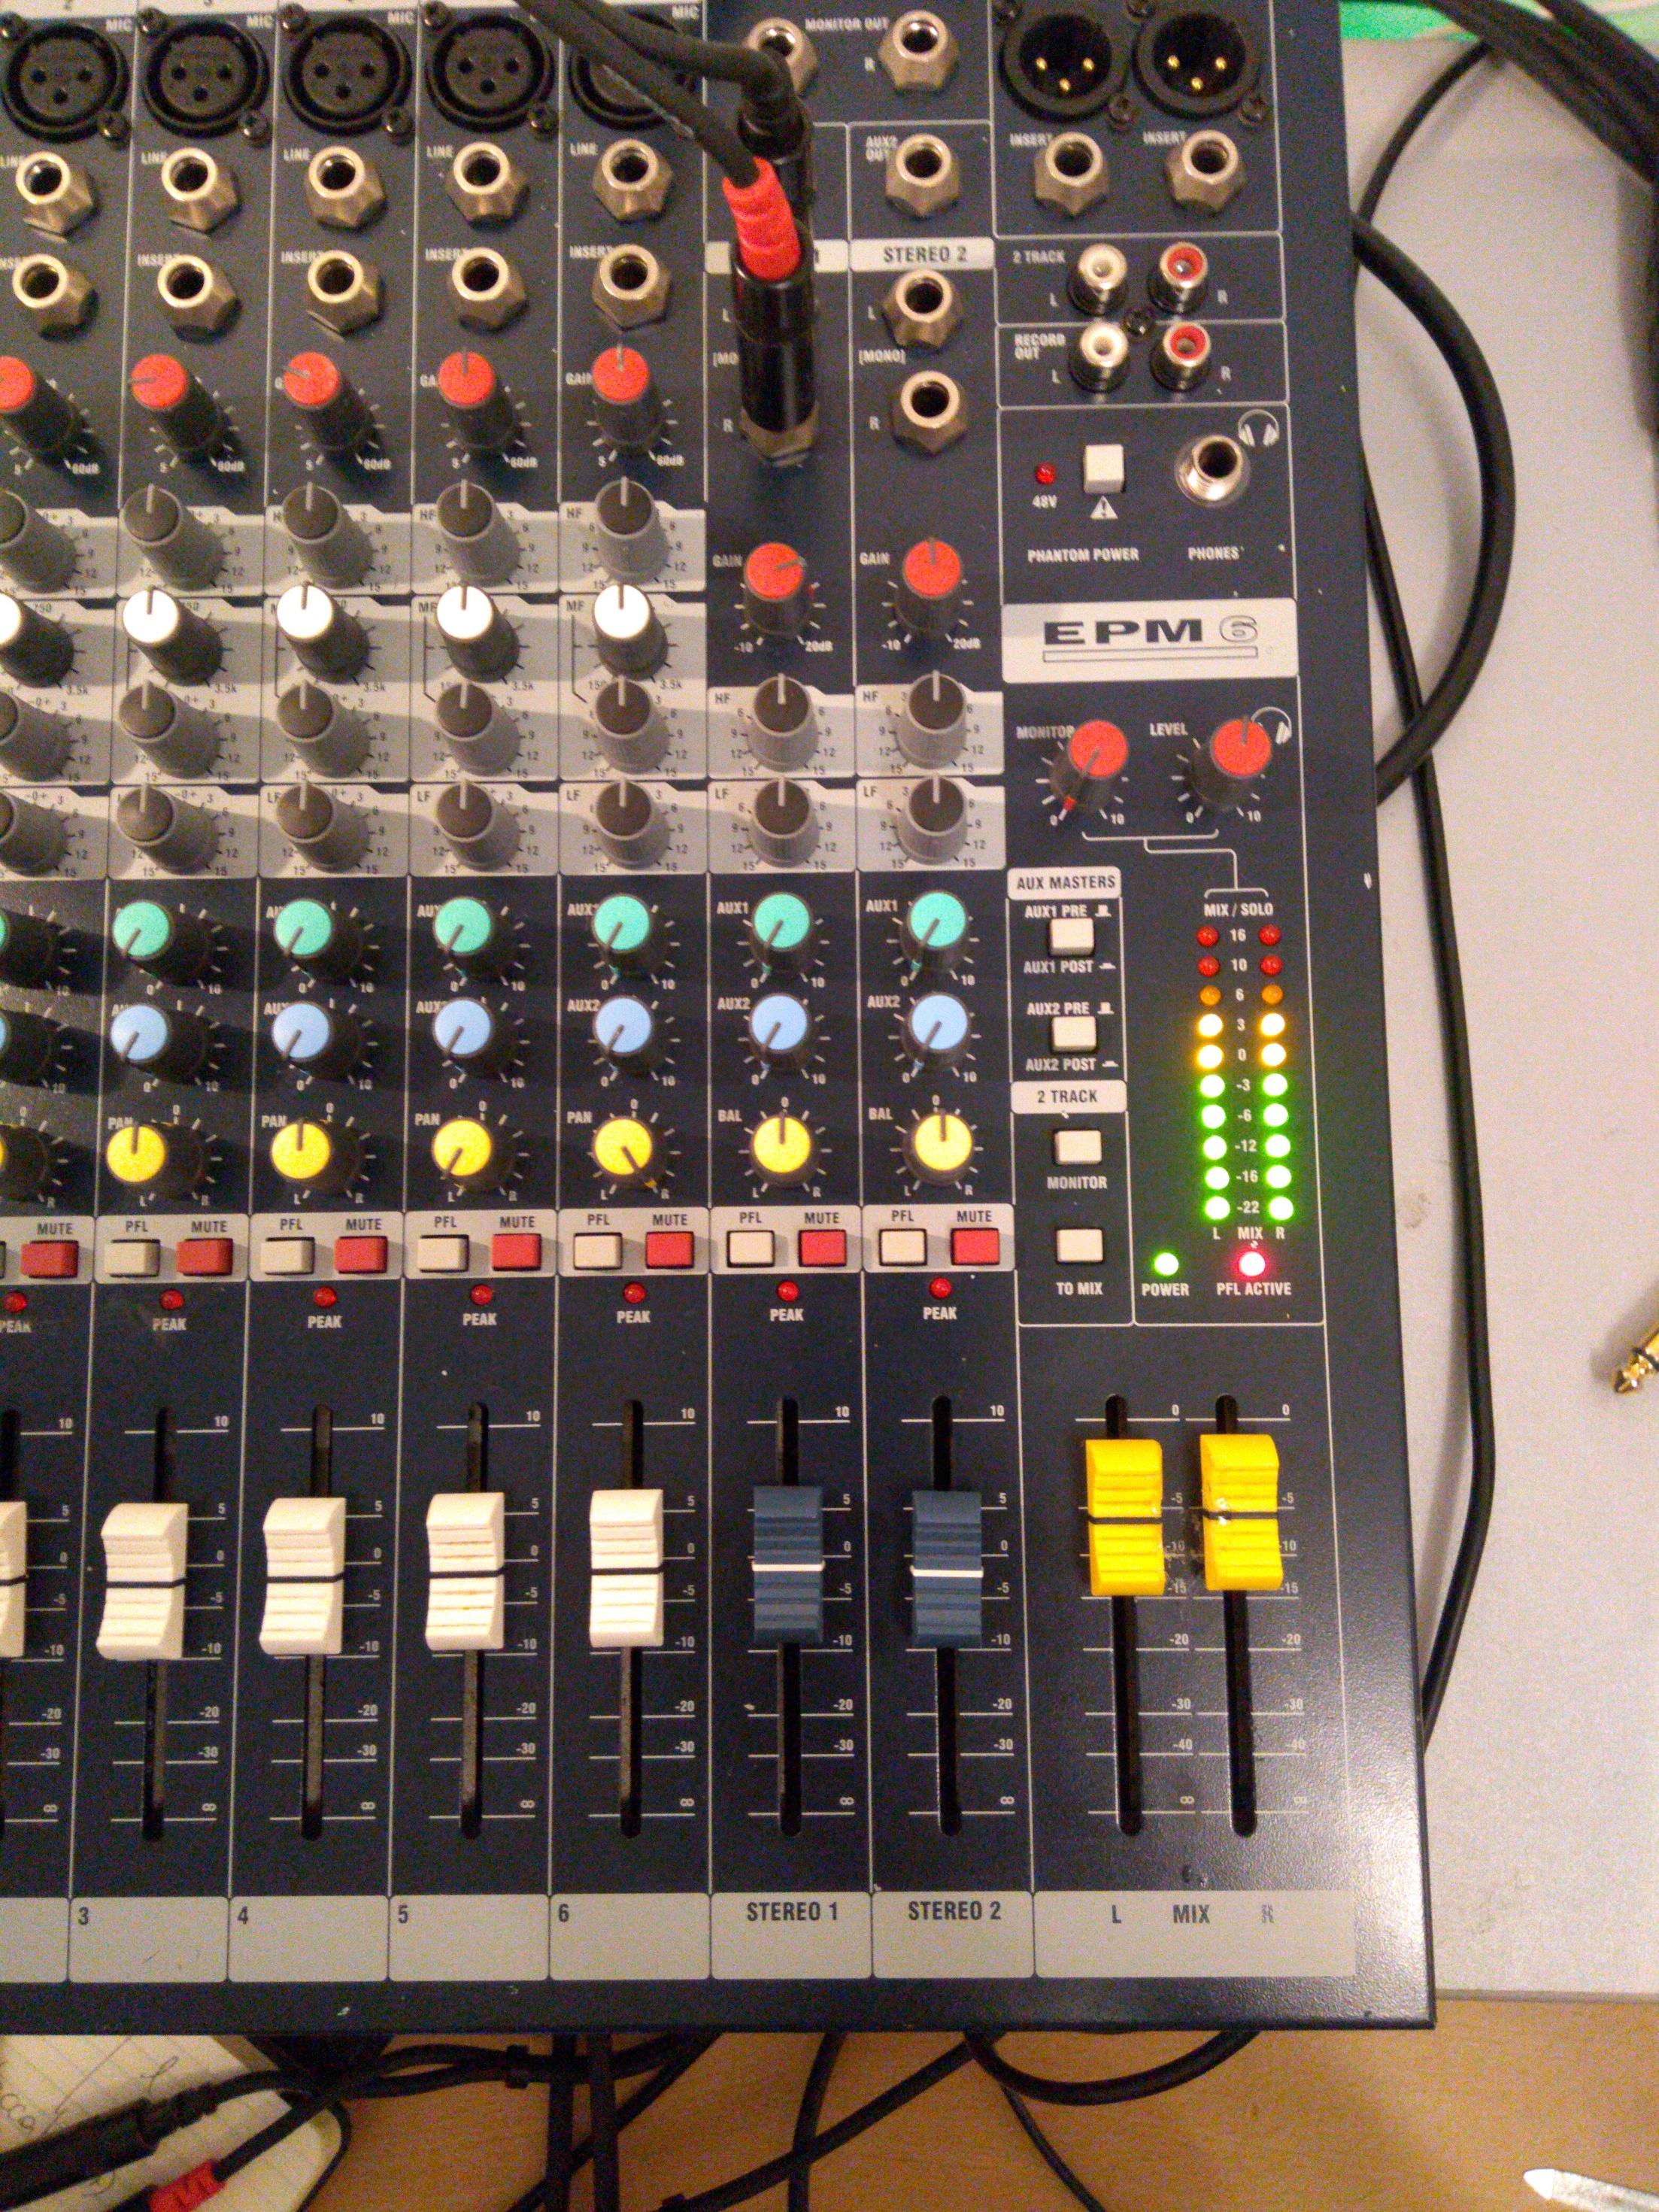 Soundcraft EPM 6 - no output left channel (Phones / MIX / Monitor